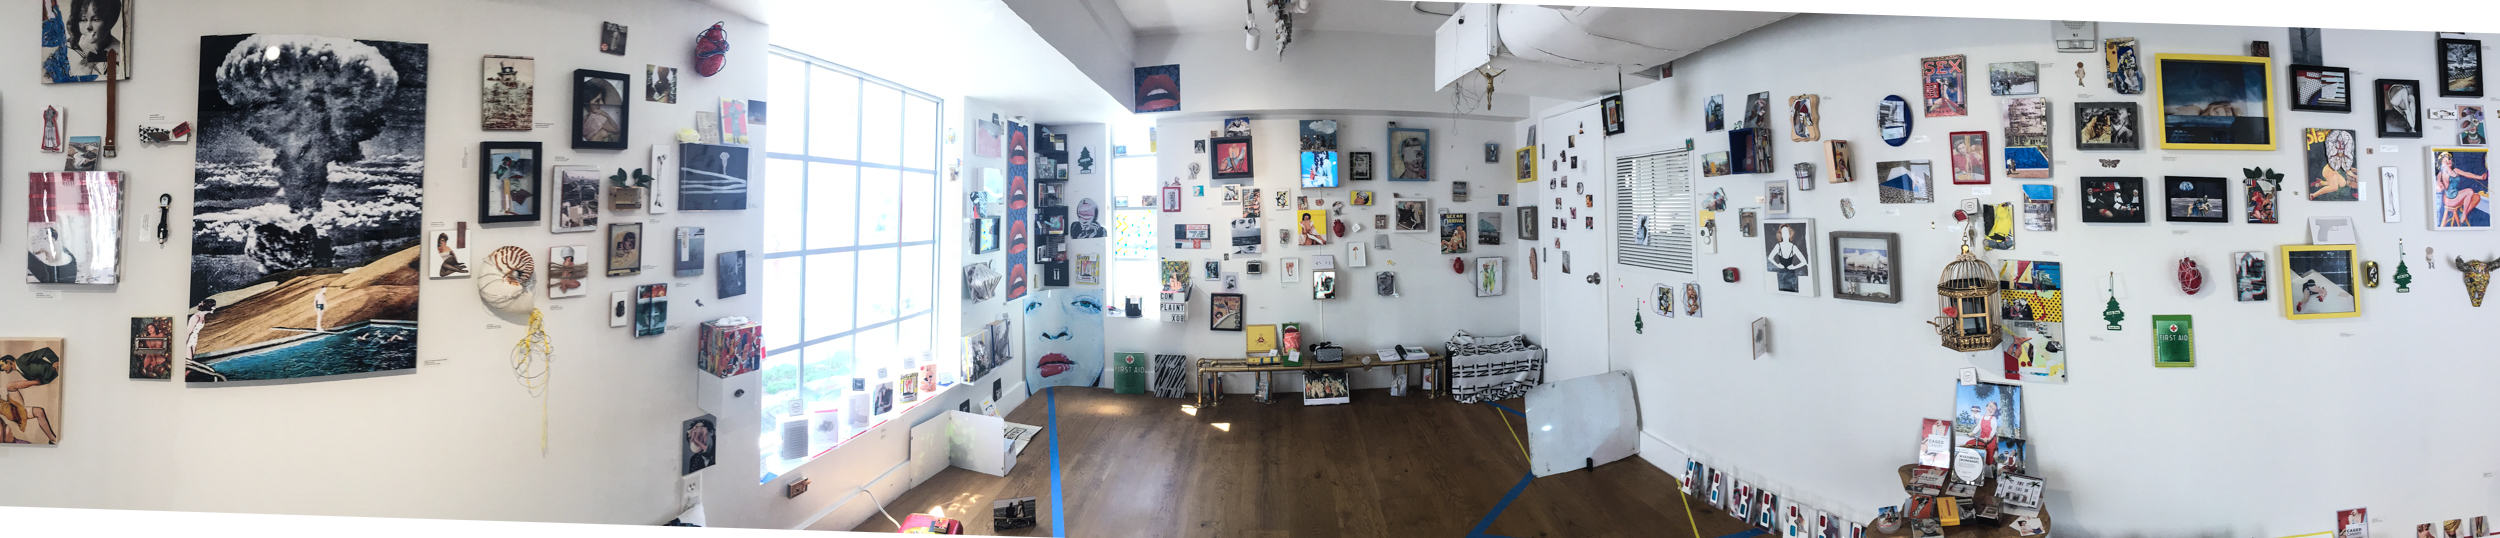 Faena-Exhibition-Images-143.jpg